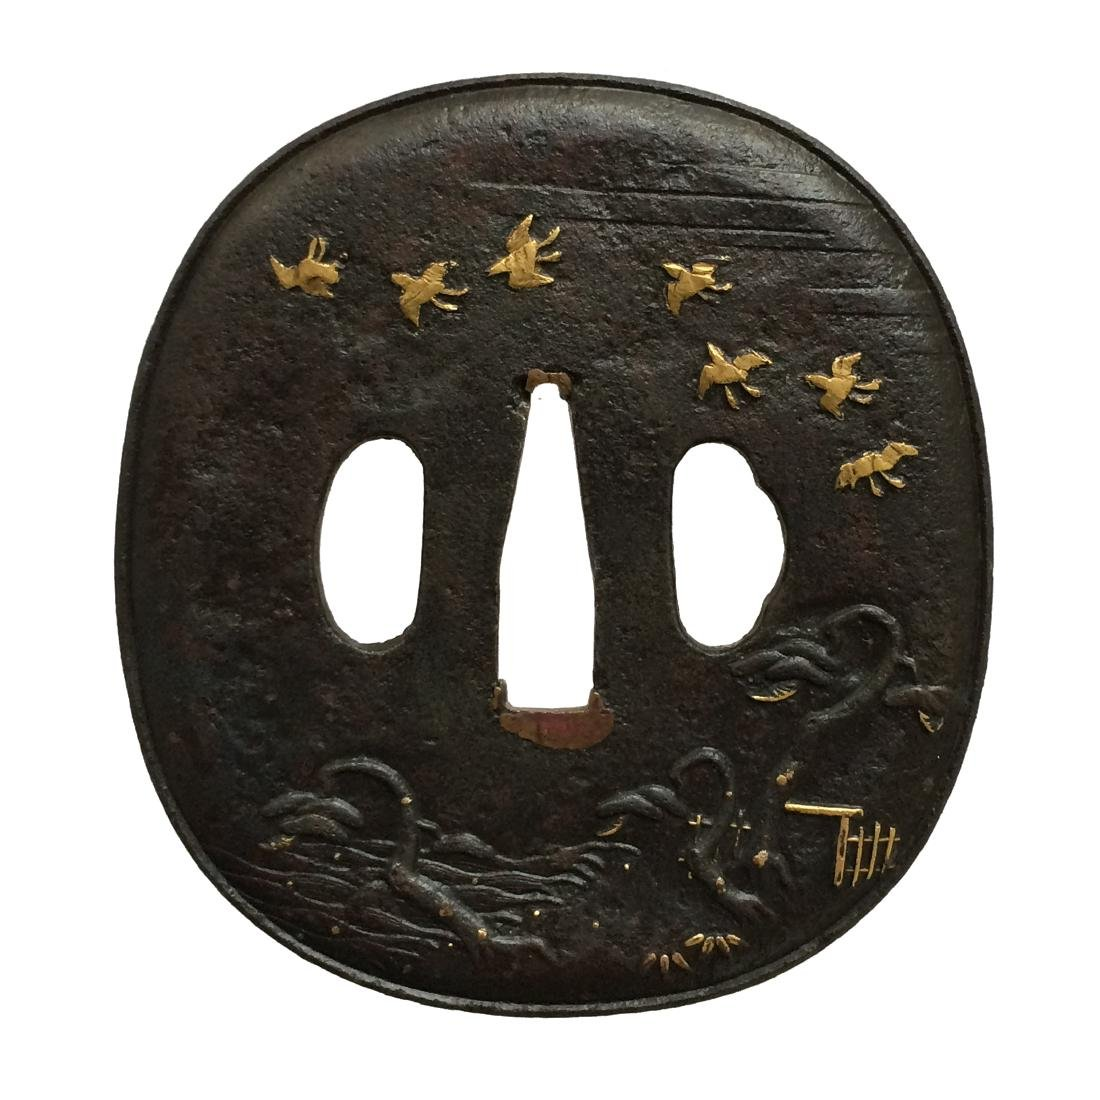 Iron tsuba by Aizu Shoami school, carved and inlaid